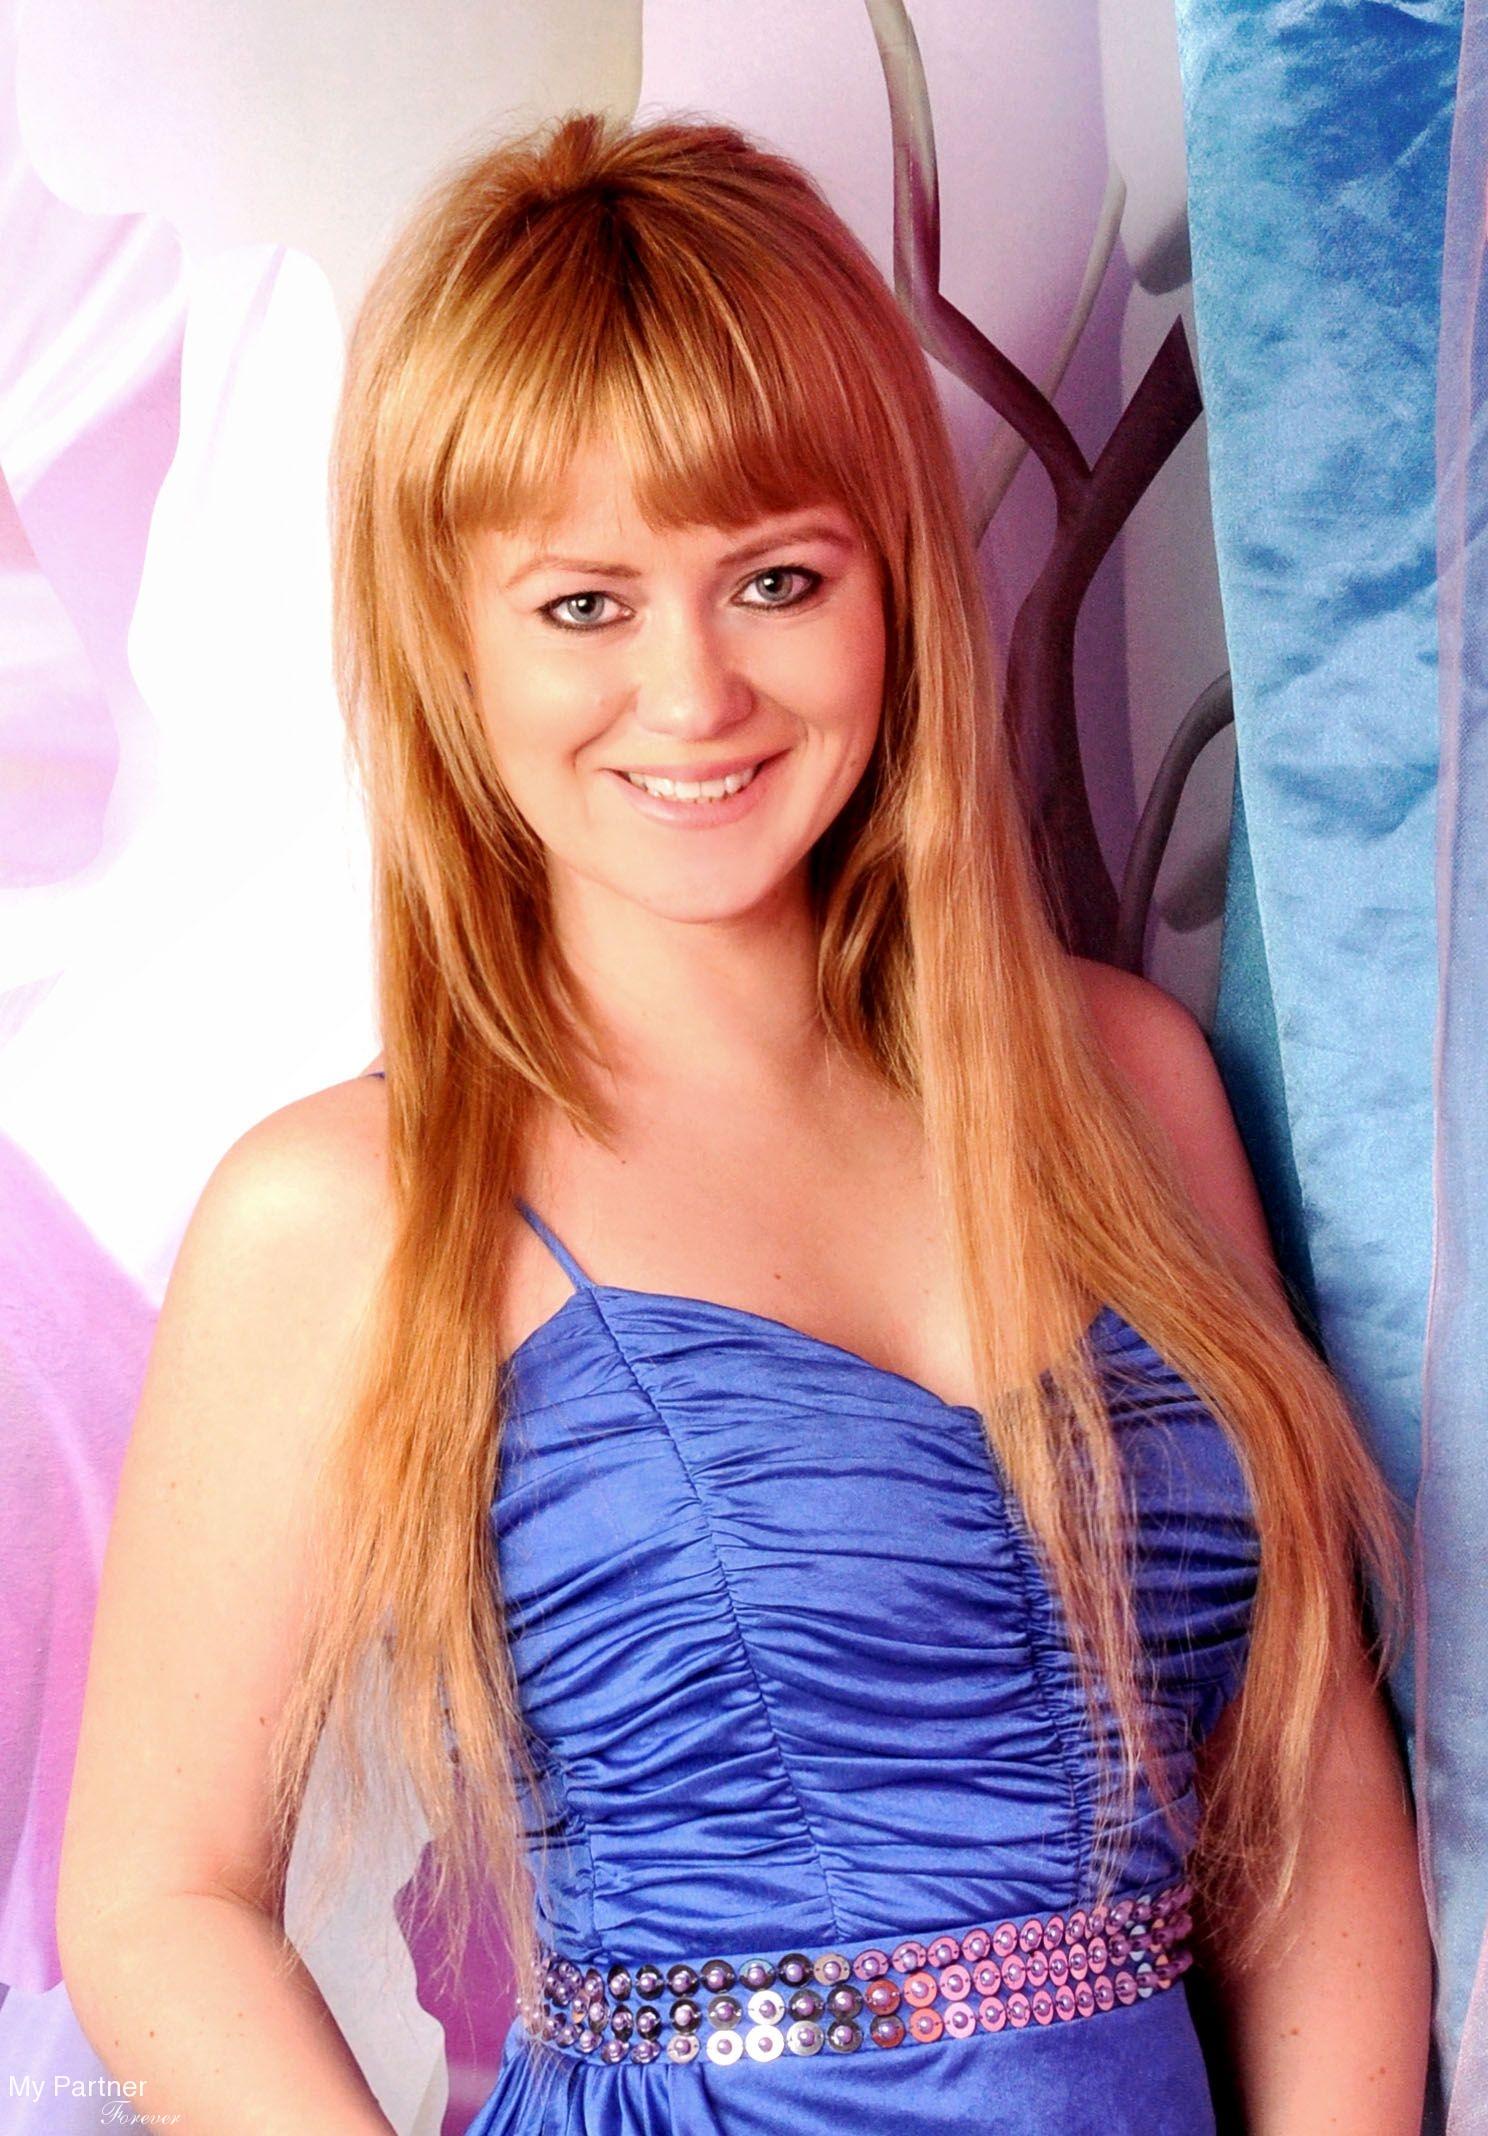 Beautiful Lady from Ukraine - Albina from Kharkov, Ukraine